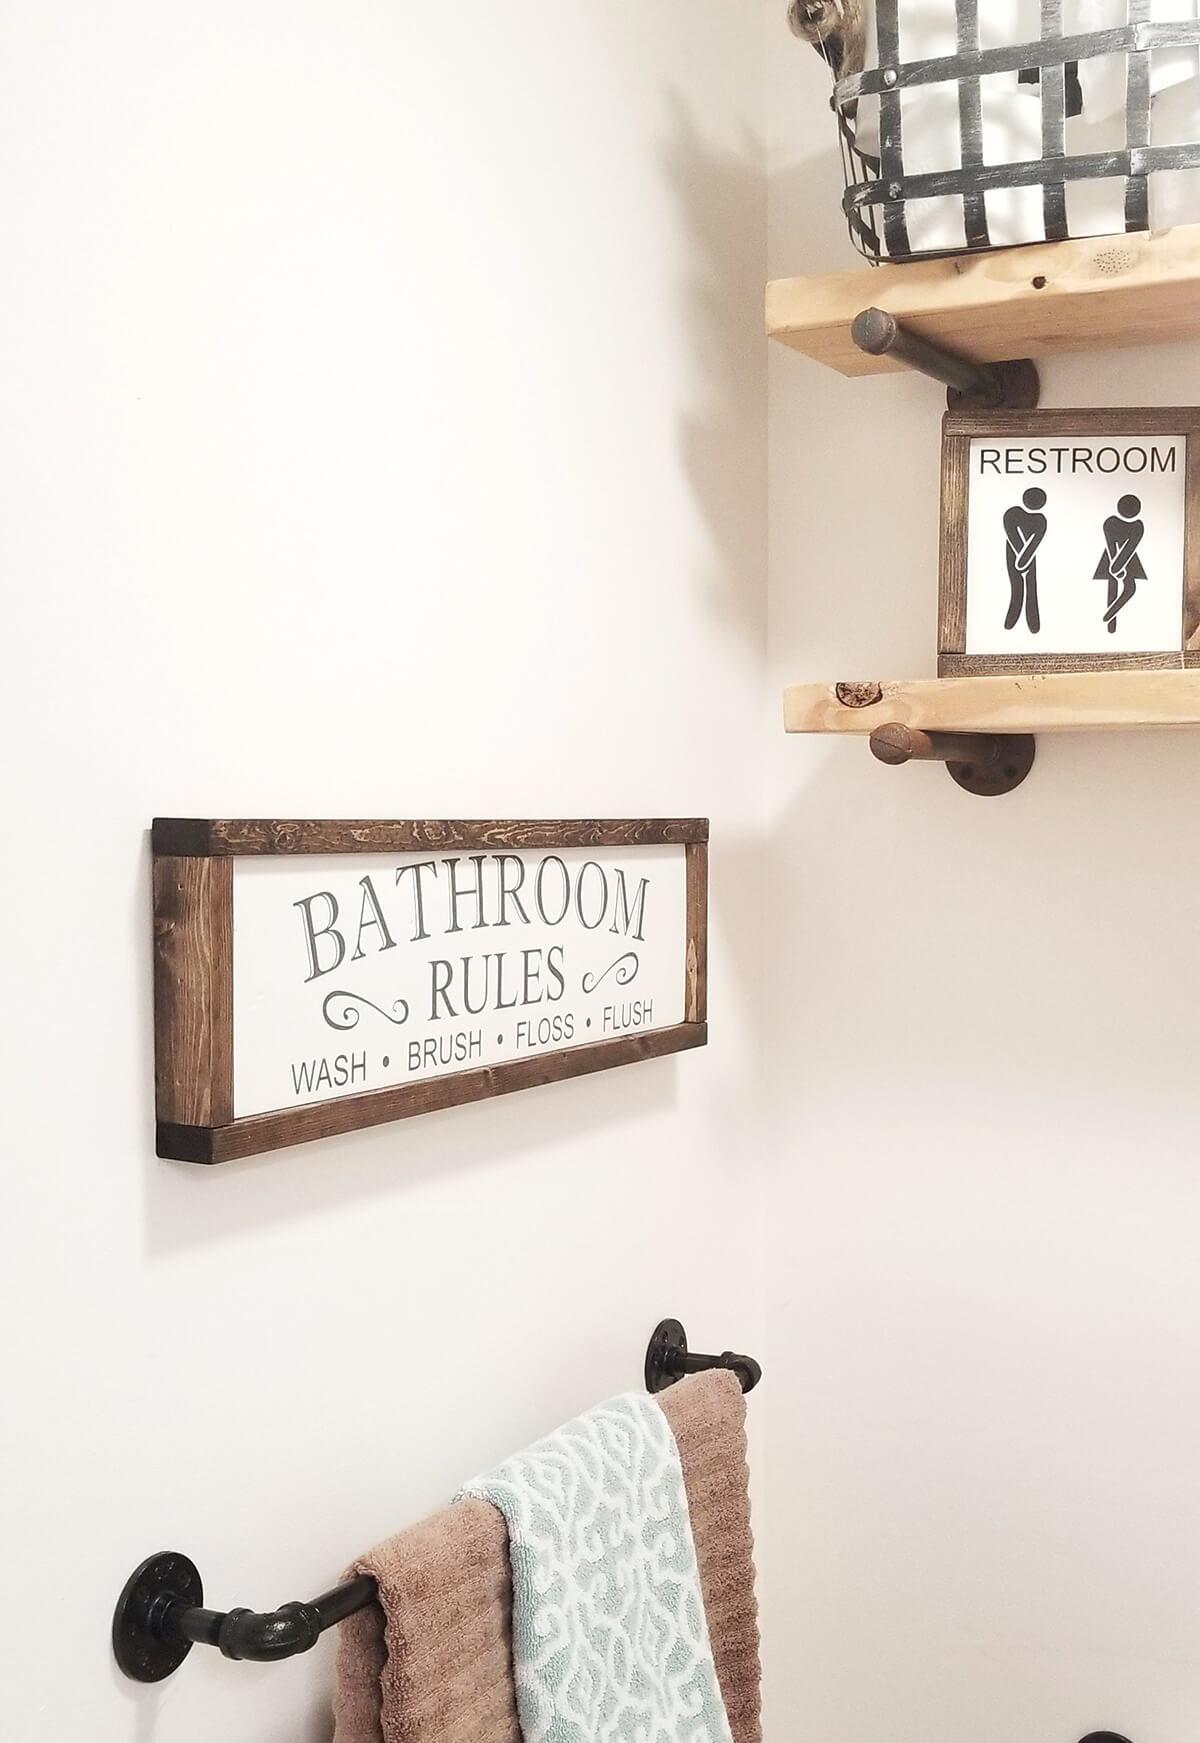 Enseigne murale de ferme de règles de salle de bain